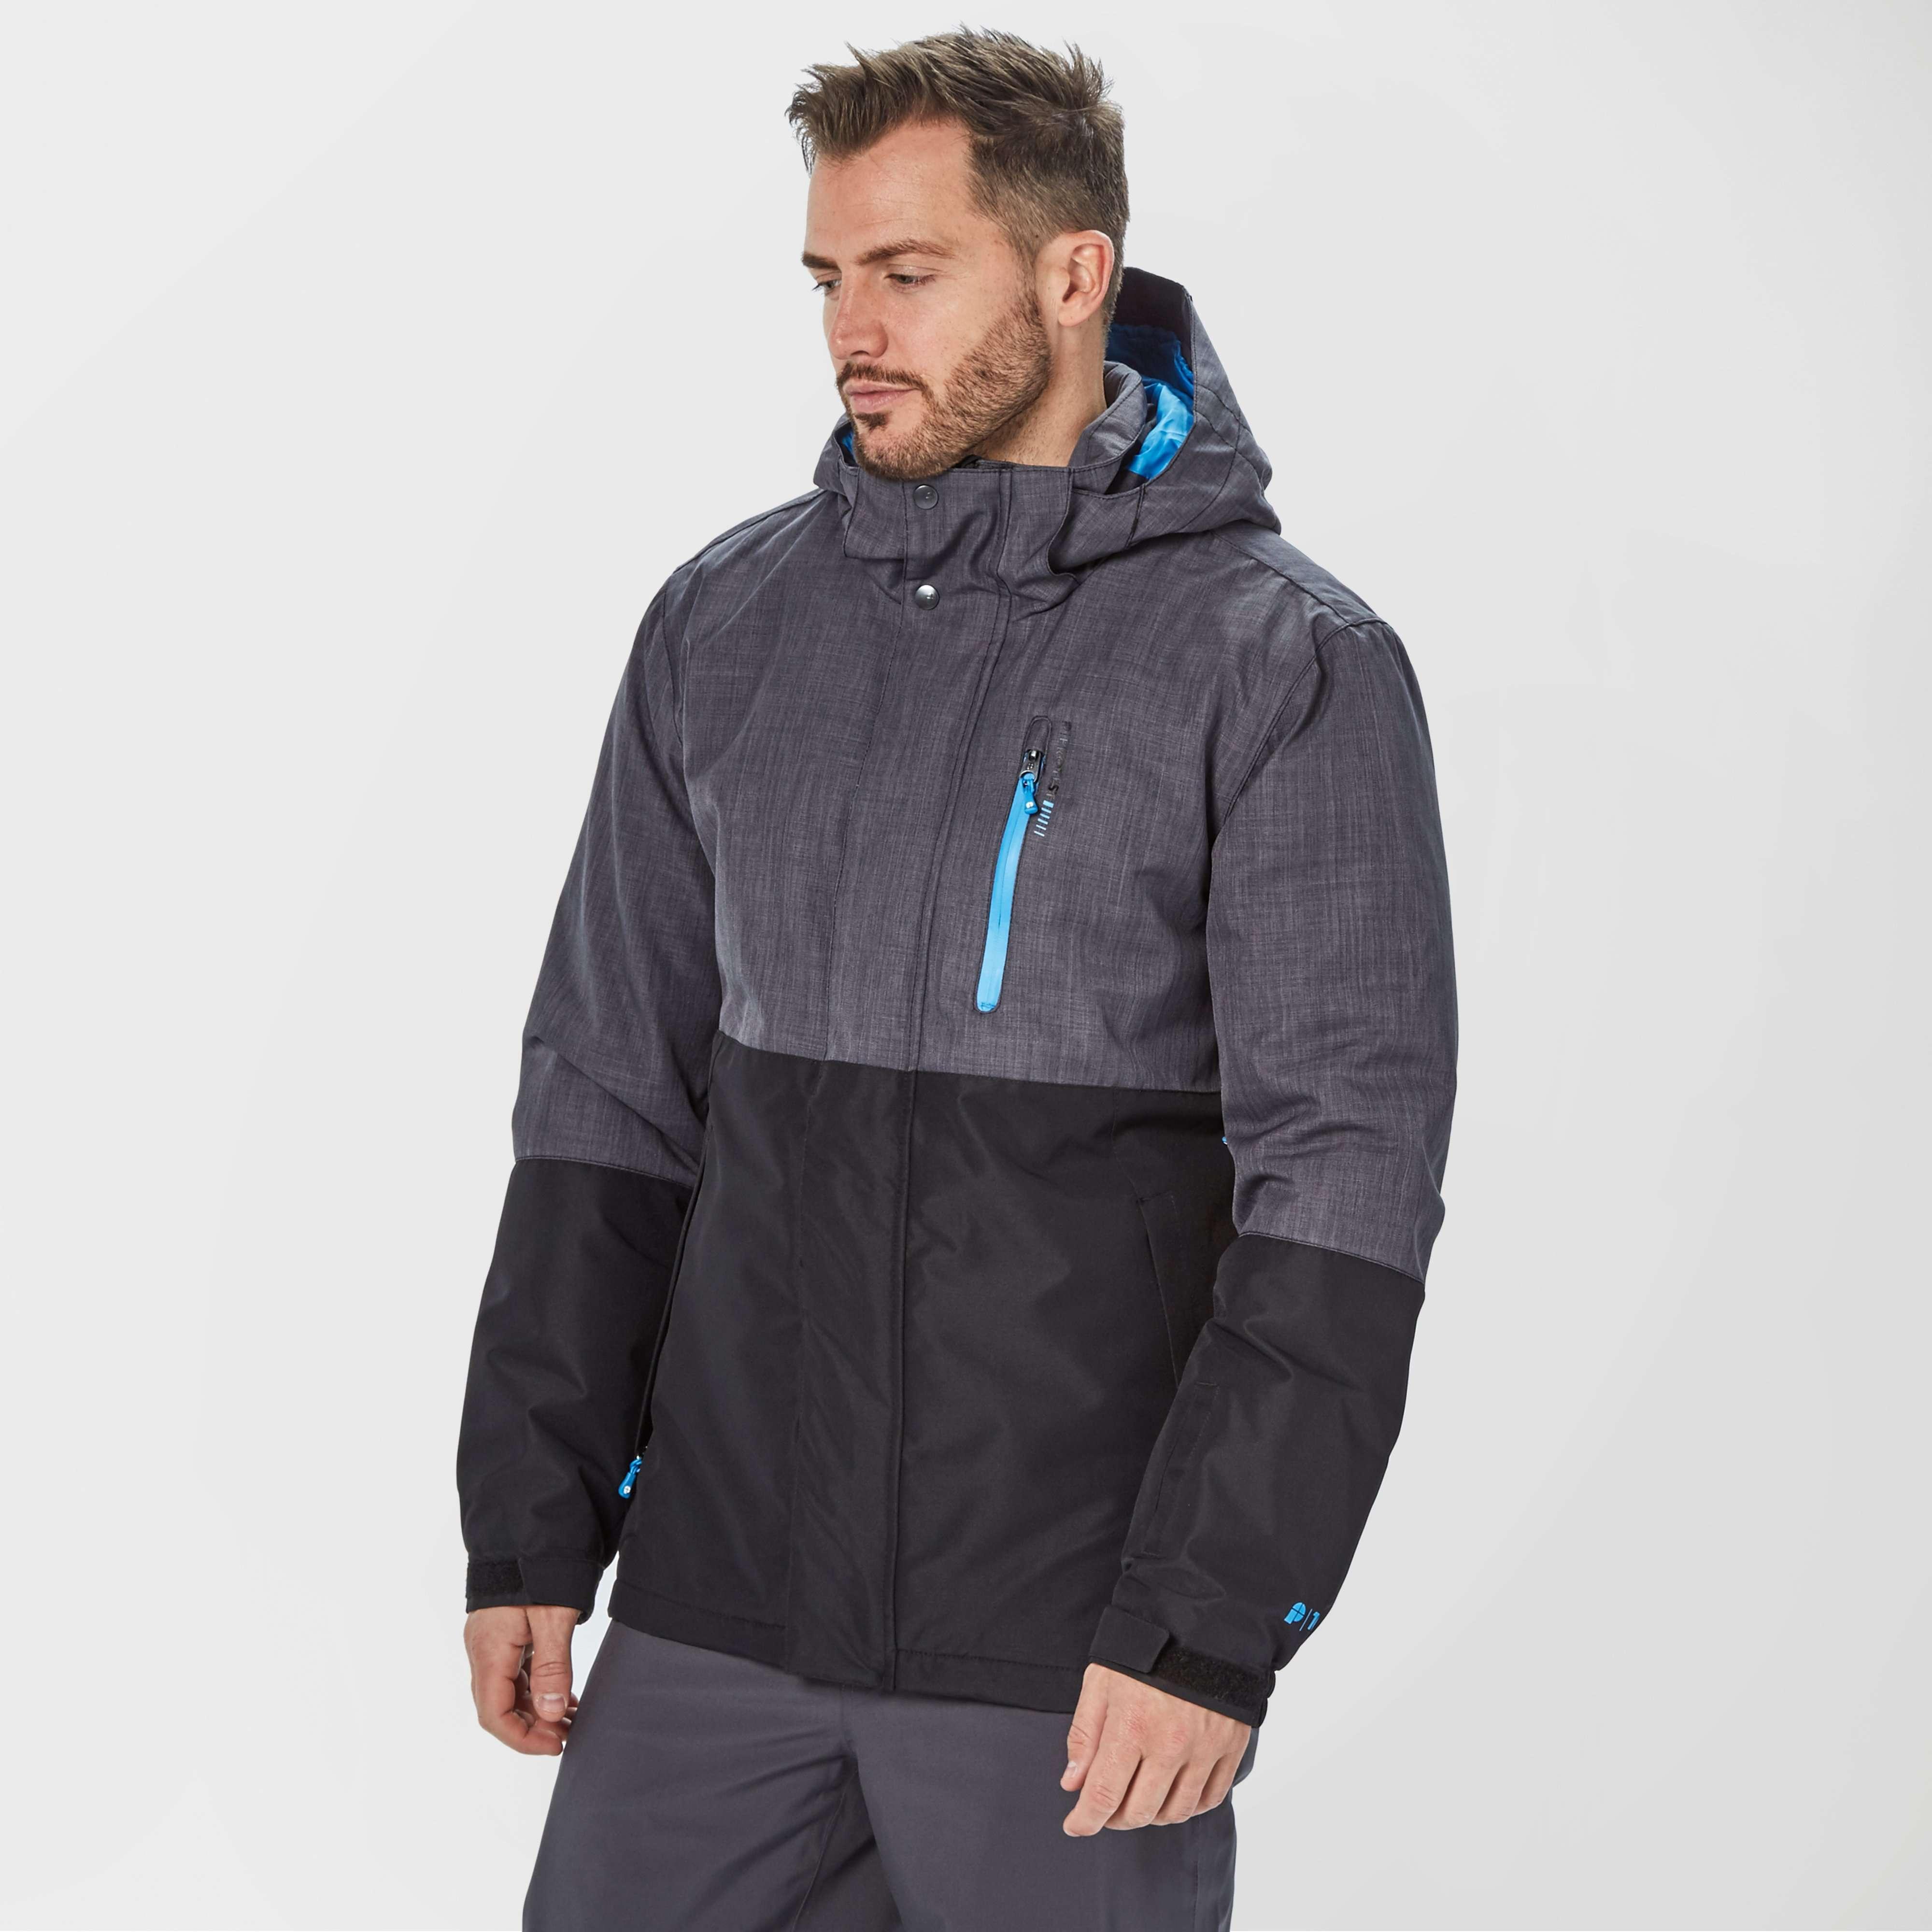 PROTEST Men's Run Ski Jacket